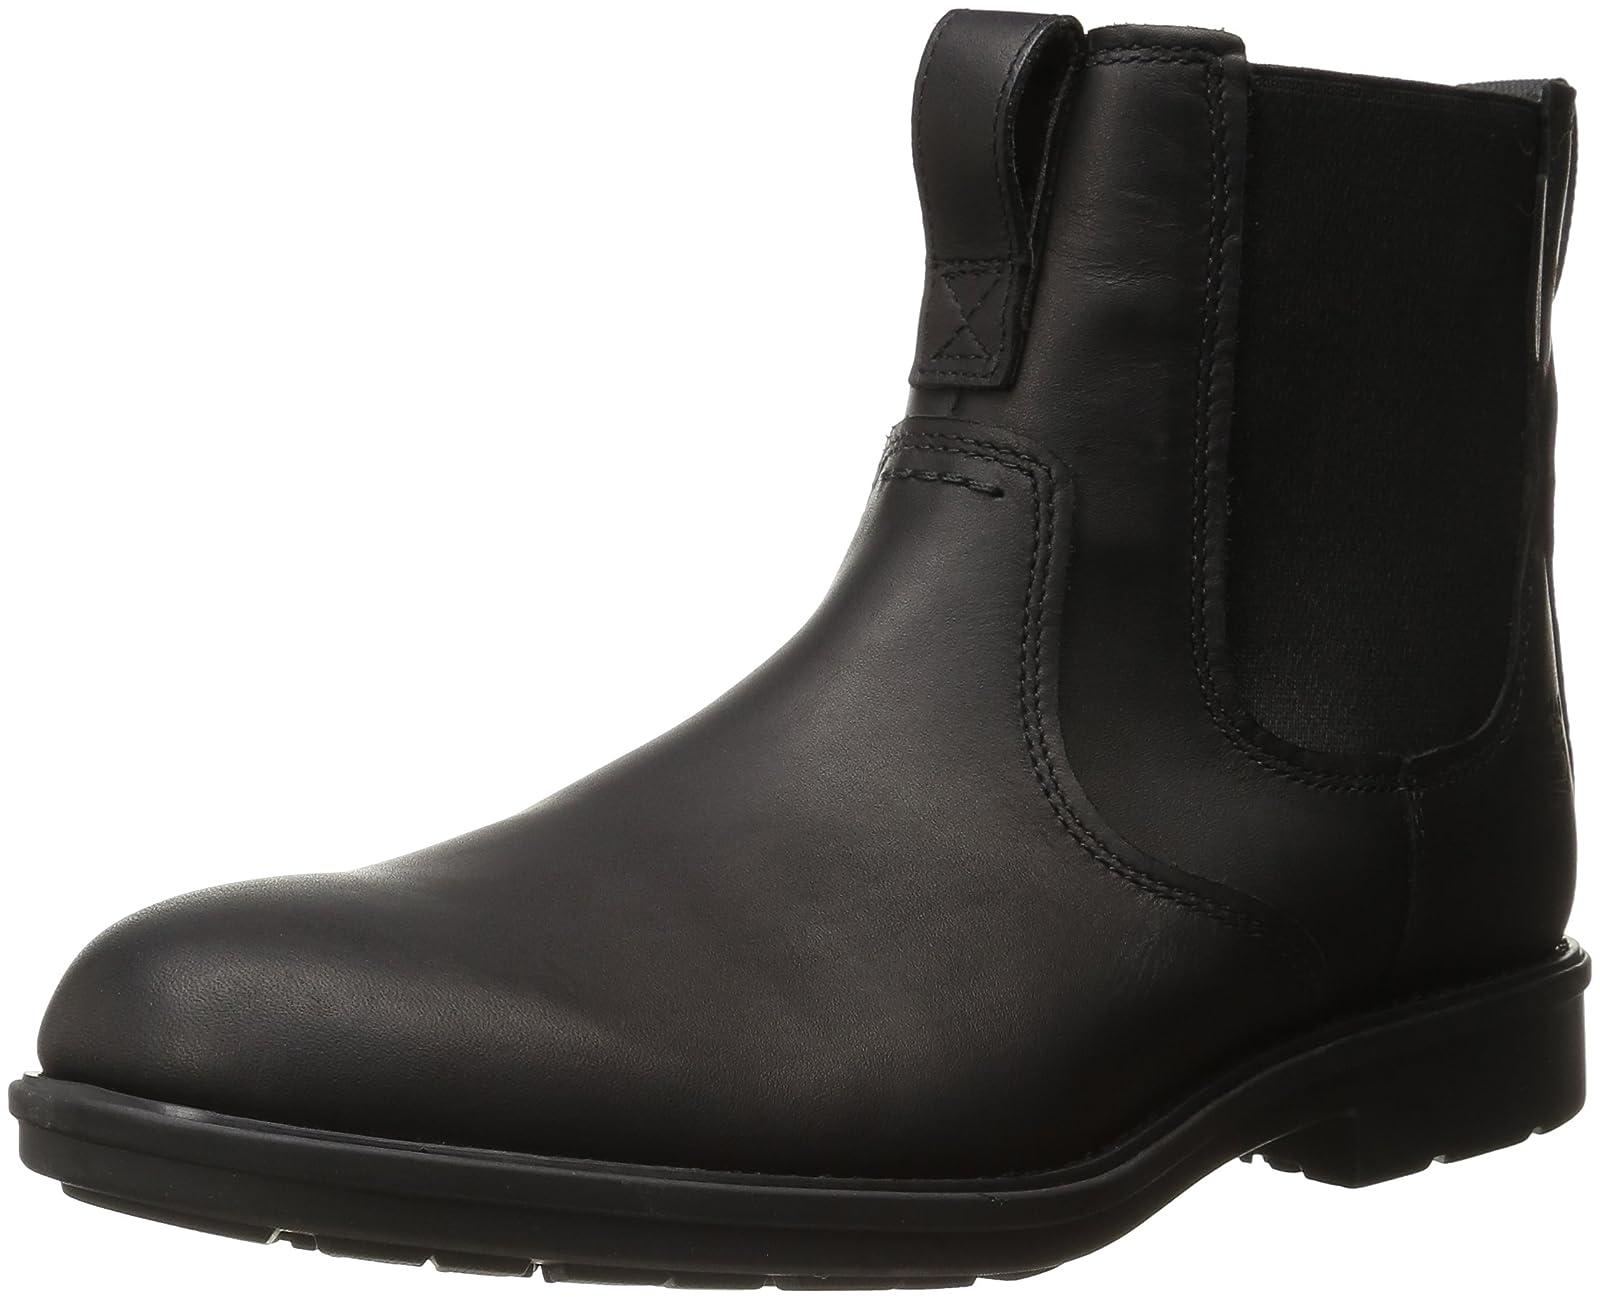 Timberland Men's Carter Notch PT Chelsea Boot 8 M US - 1